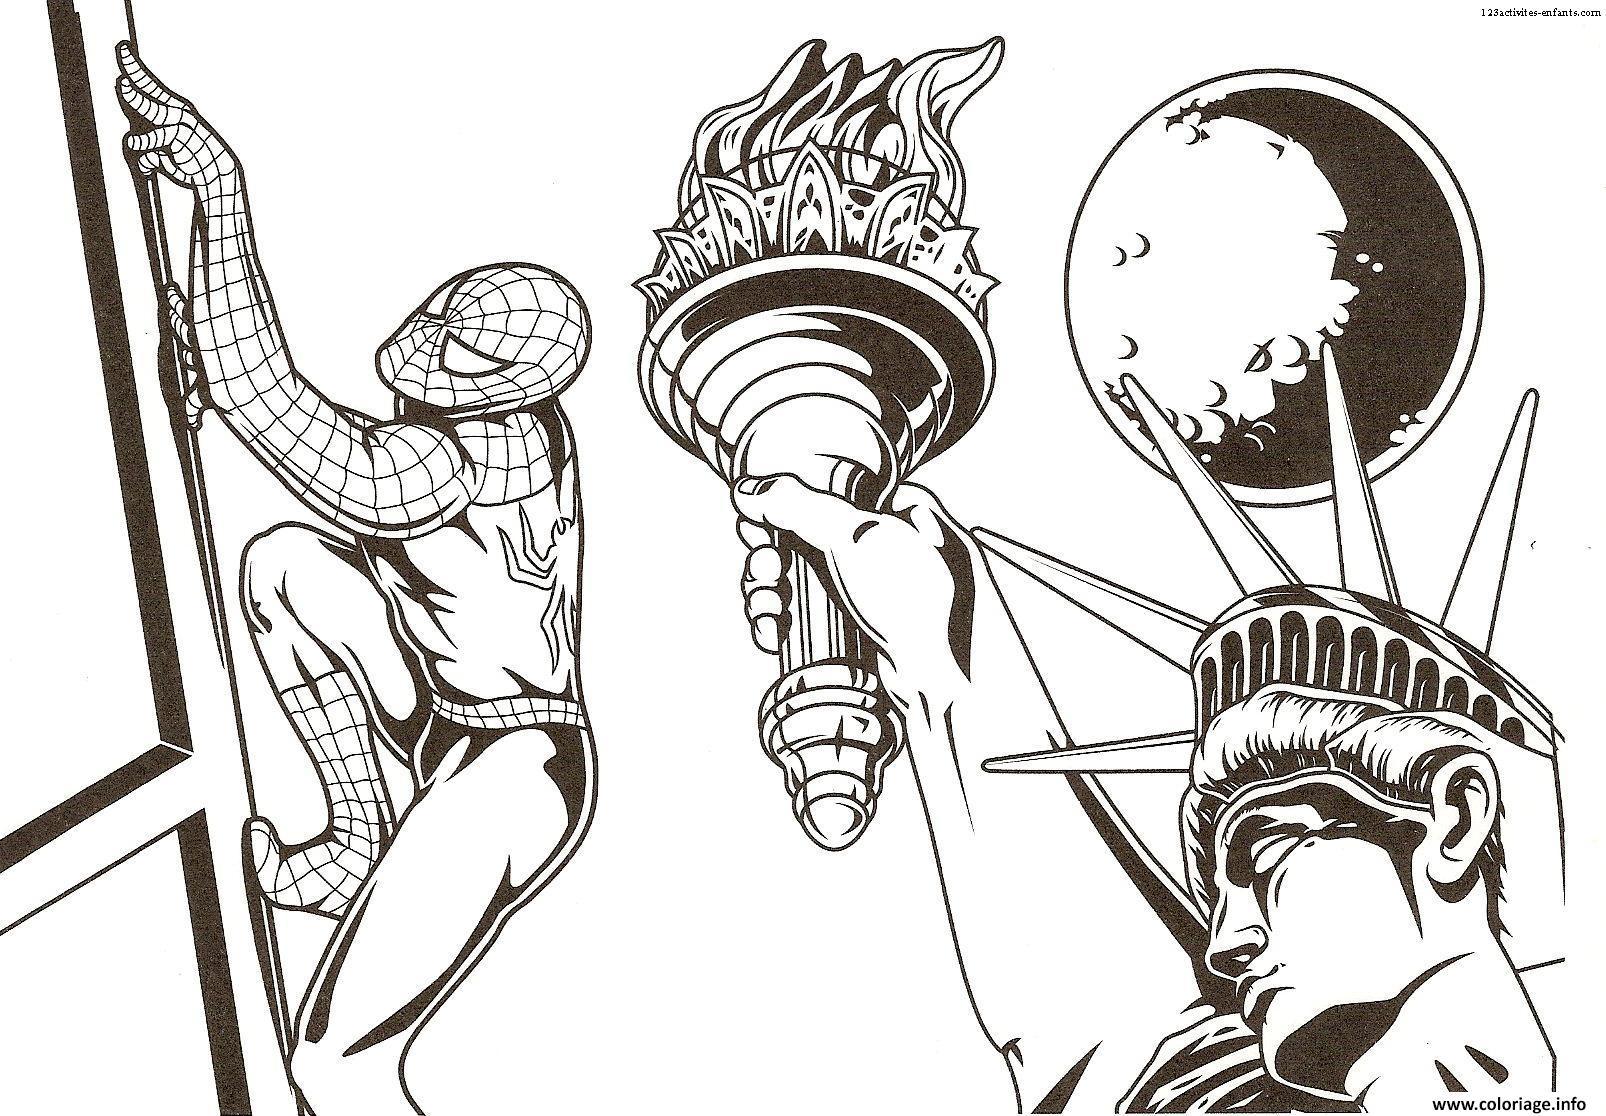 Coloriage spiderman dans la ville de newyork avec la - Coloriage en ligne spiderman ...